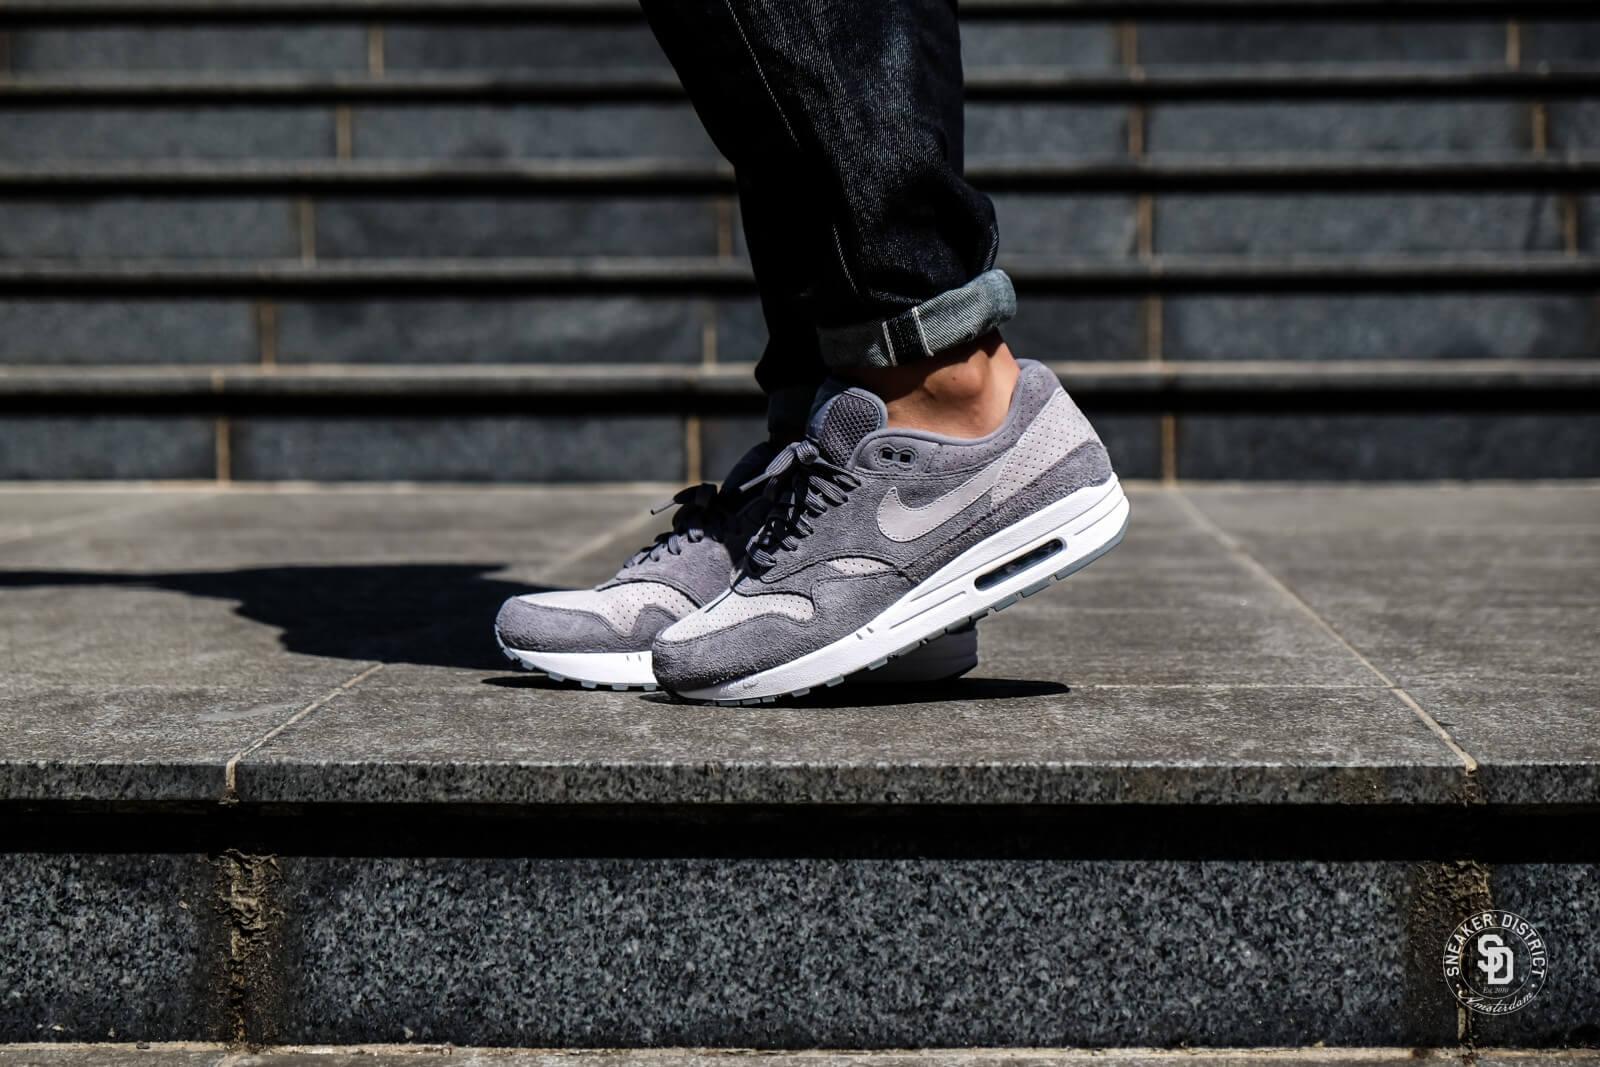 nike air max cool grey schwarz